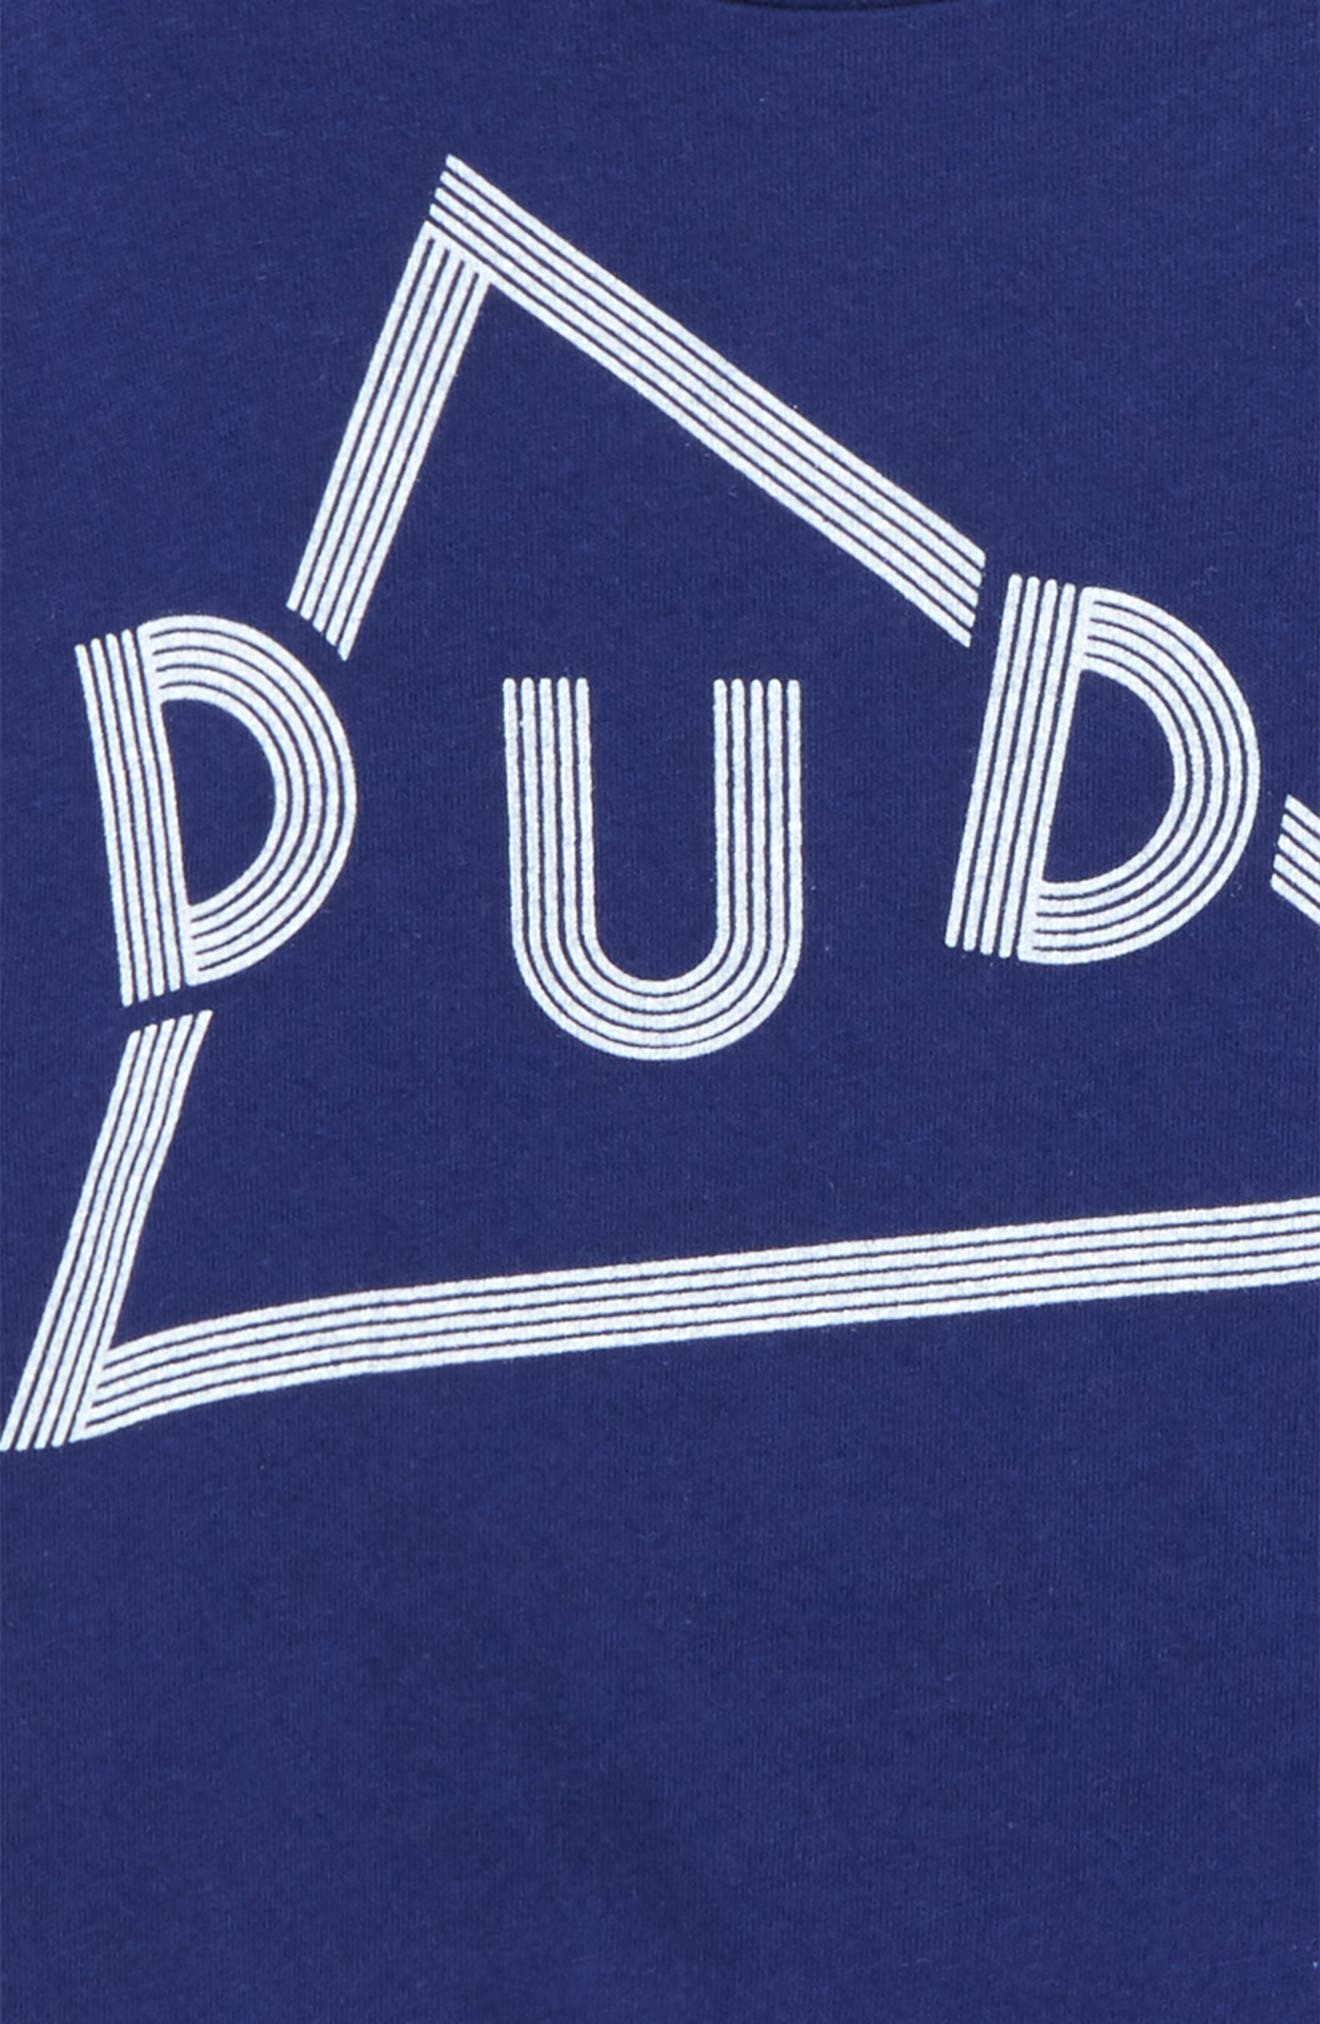 Dude Graphic T-Shirt,                             Alternate thumbnail 2, color,                             Navy